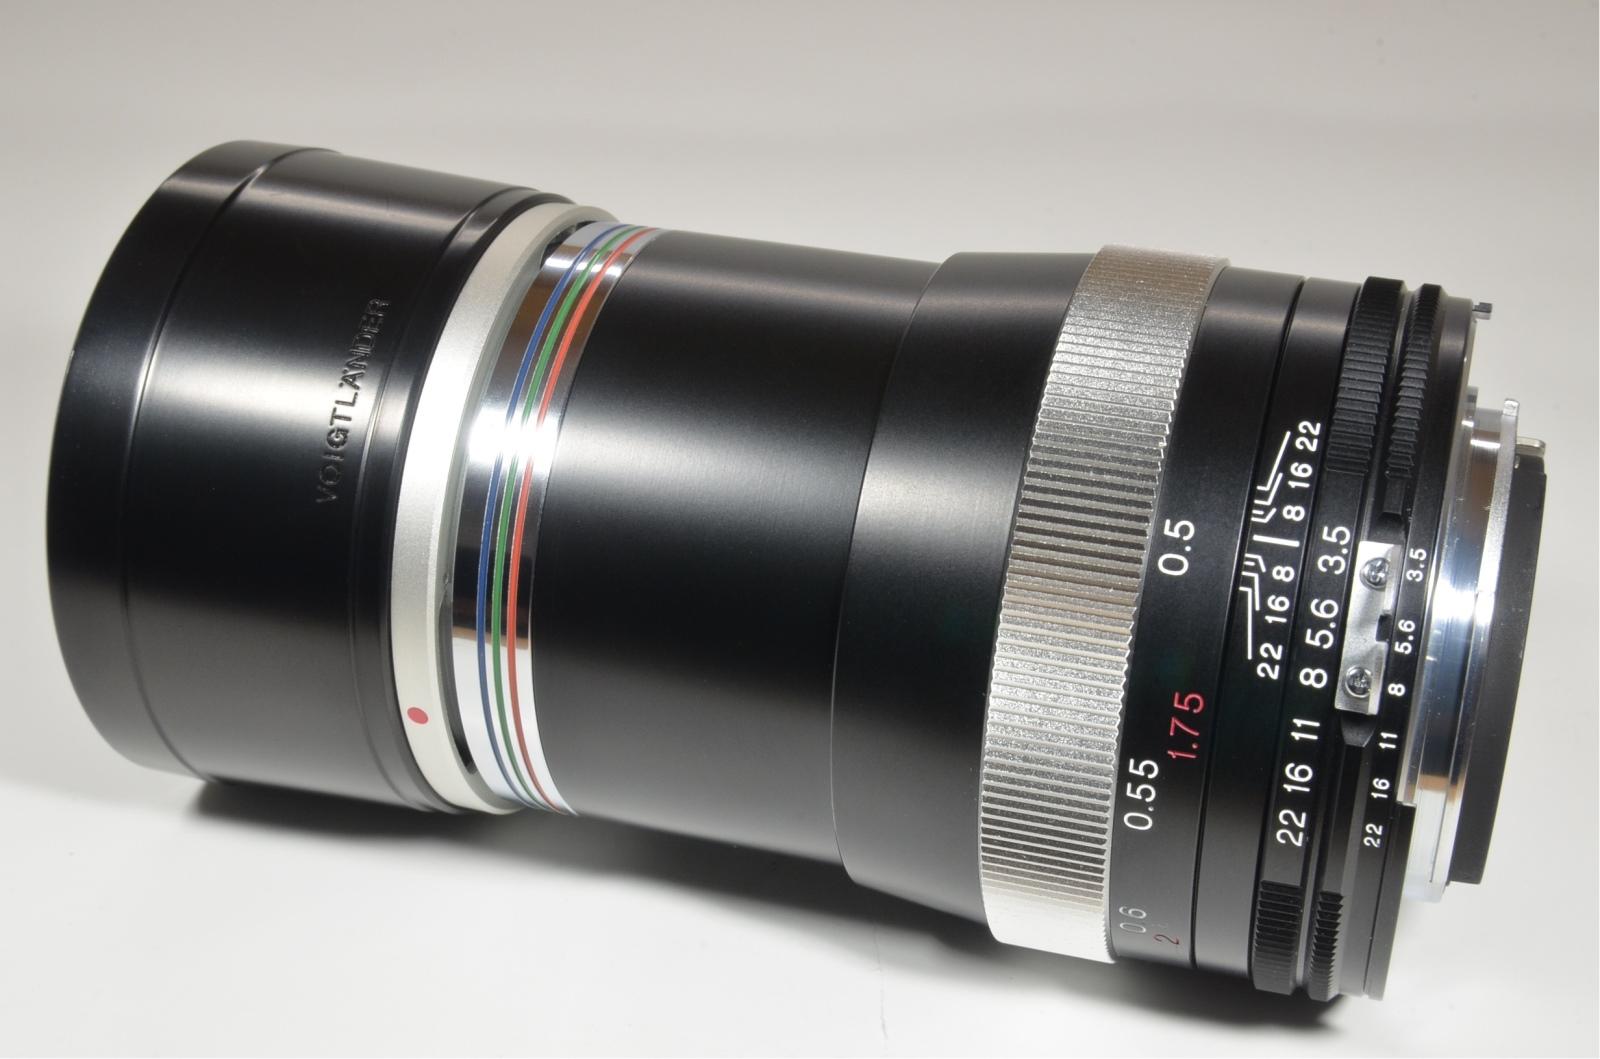 voigtlander apo-lanthar 90mm f3.5 sl ai-s nikon with lens hood